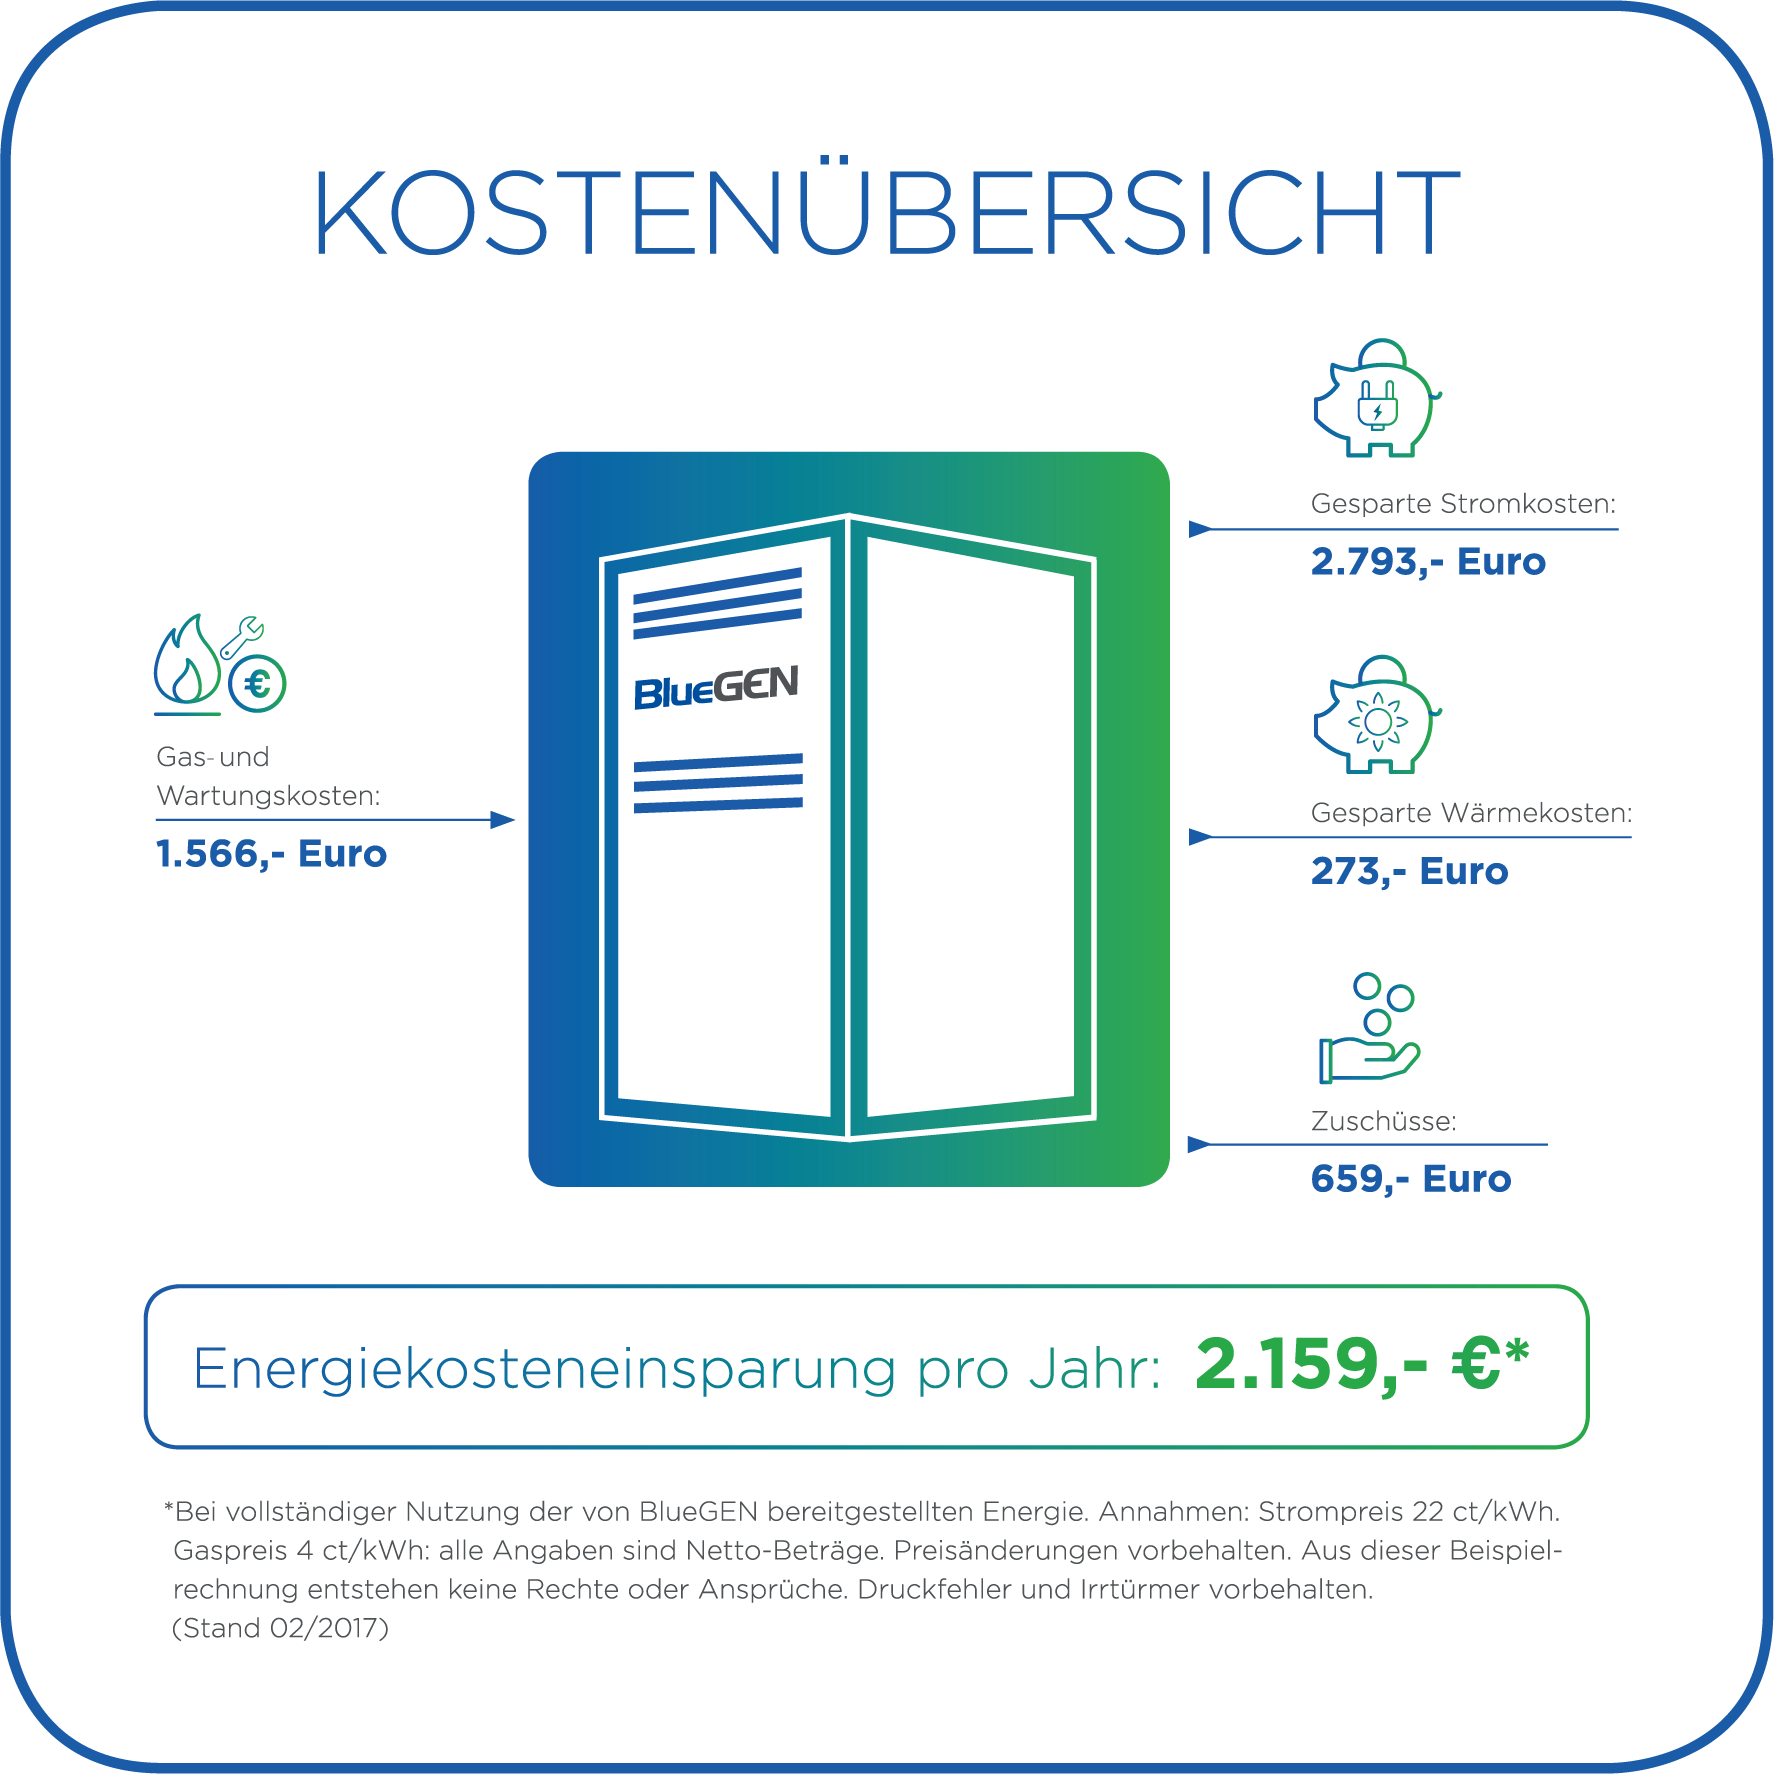 brennstoffzelle-erfolgsrechnung-elektrolink